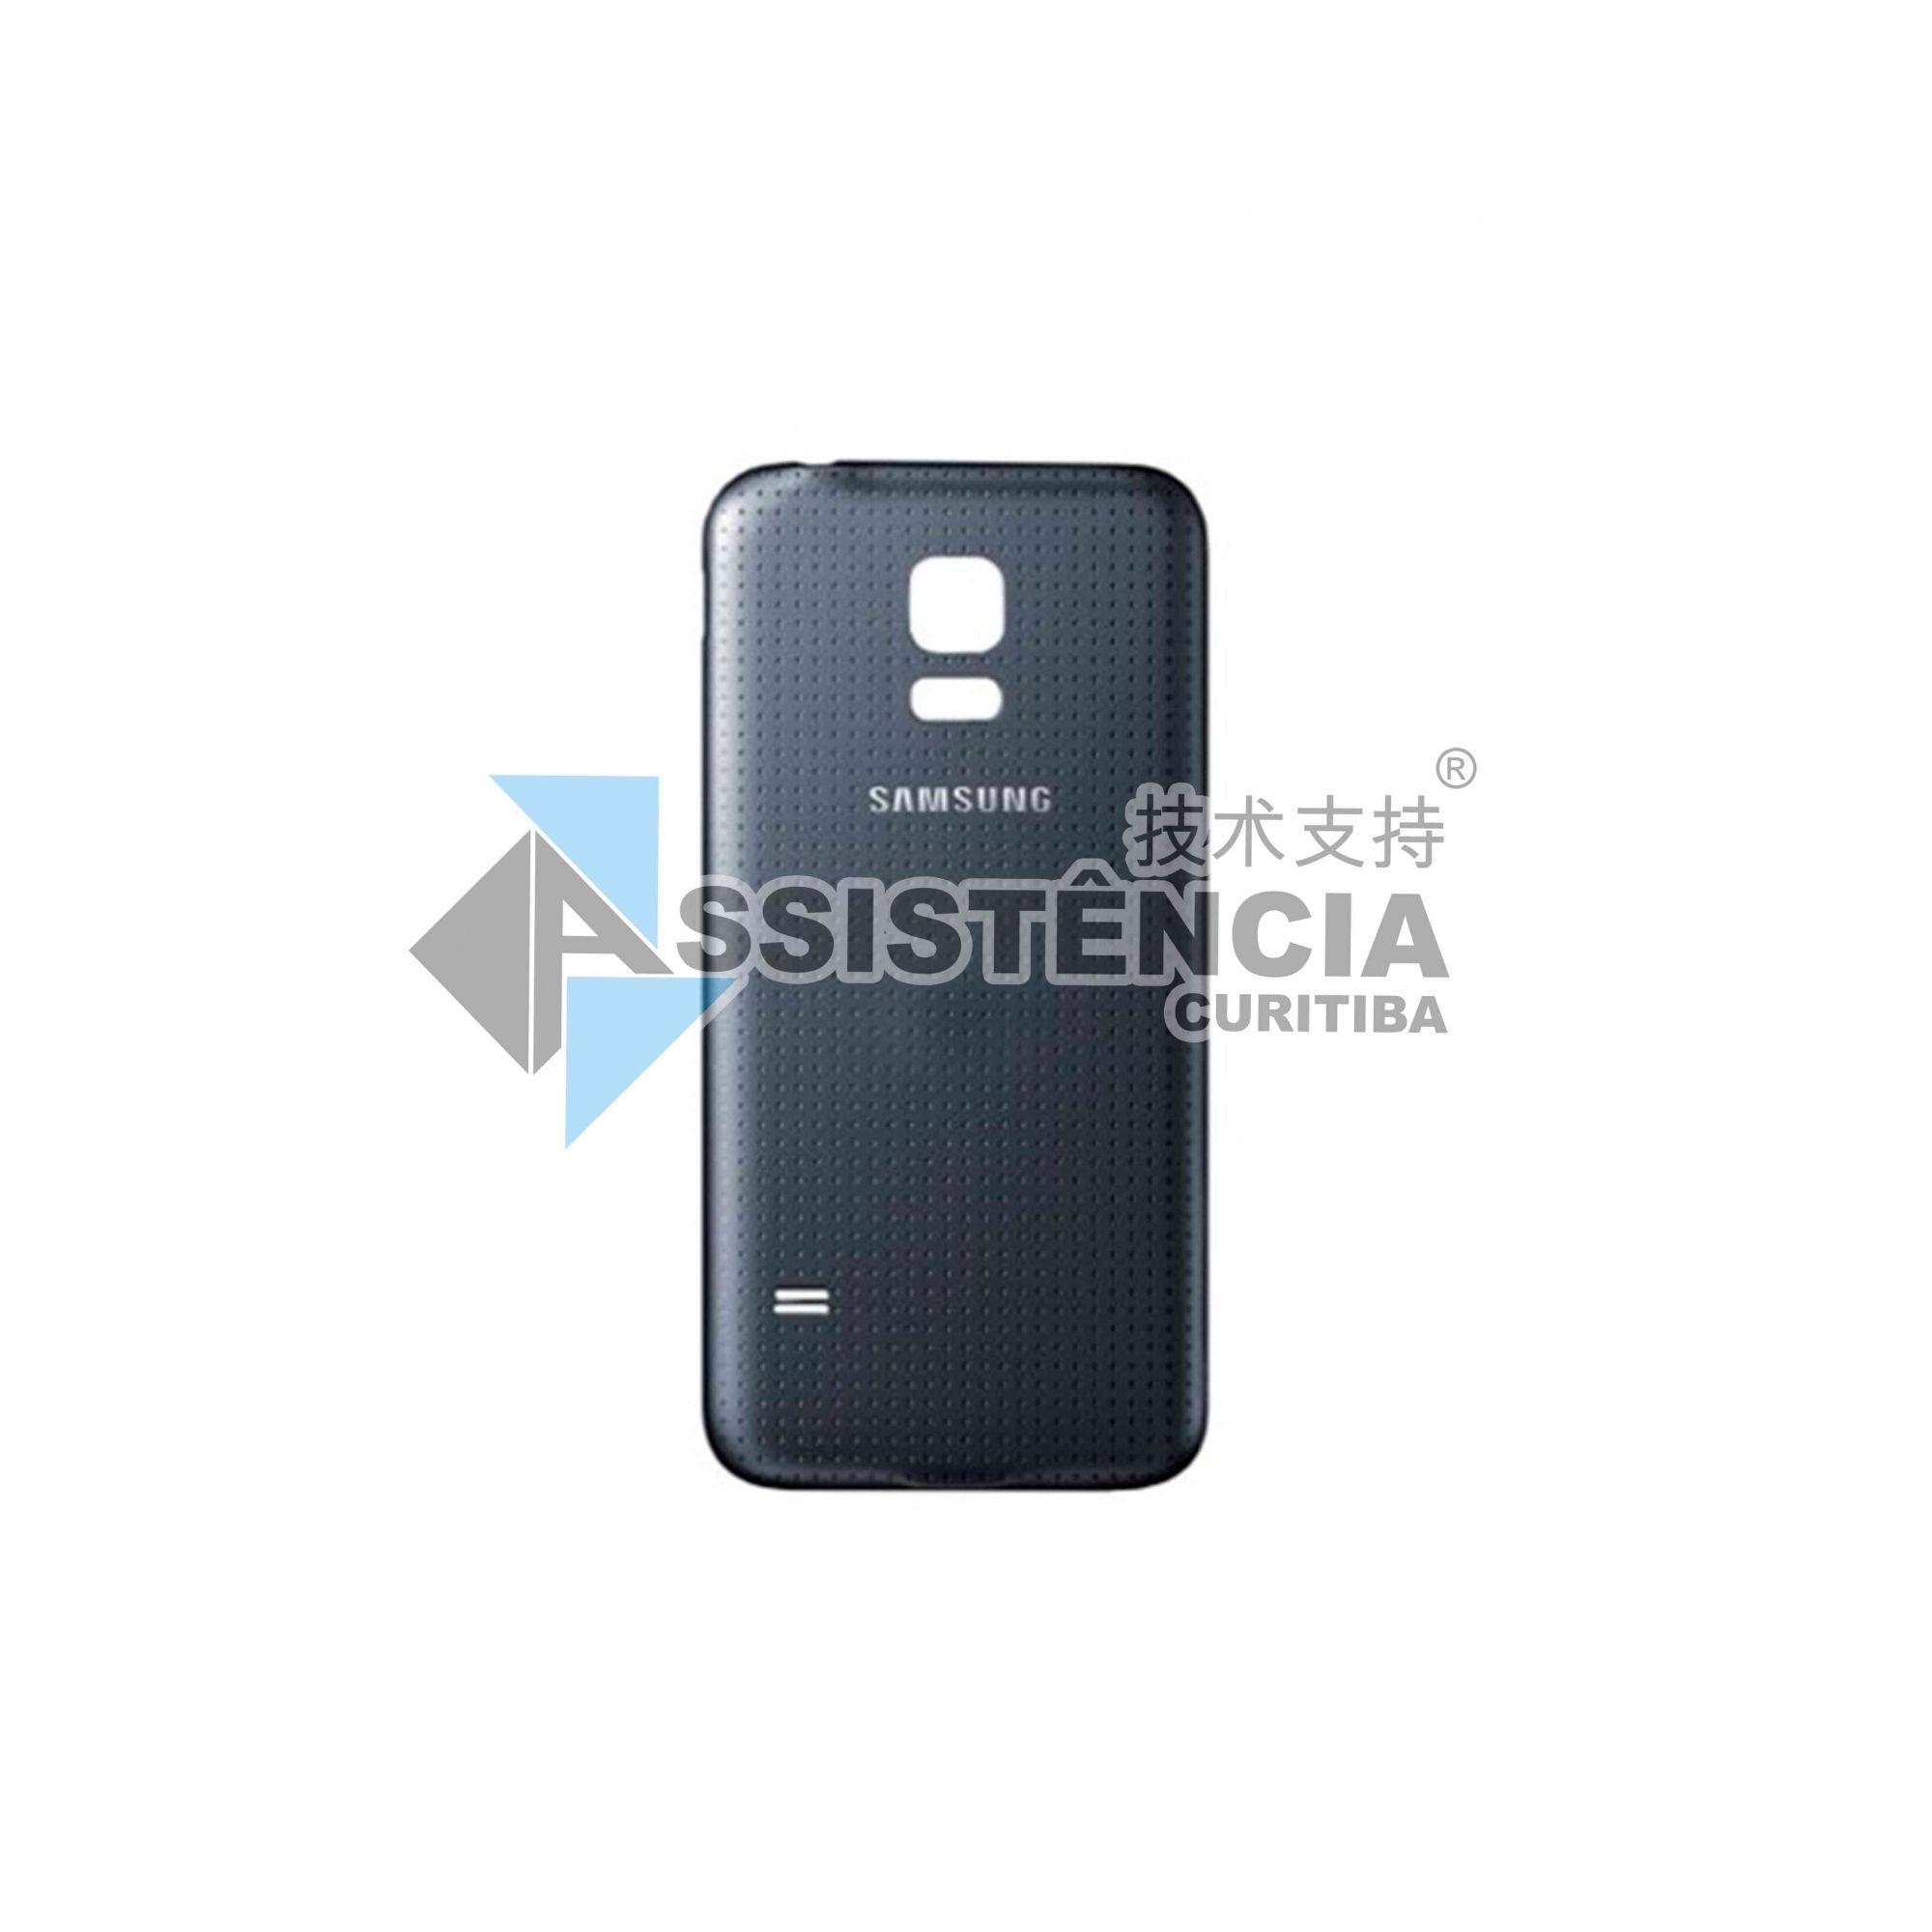 Tampa Traseira Samsung Galaxy S5 Gt-I9600 G900 G900M G900Md Preto